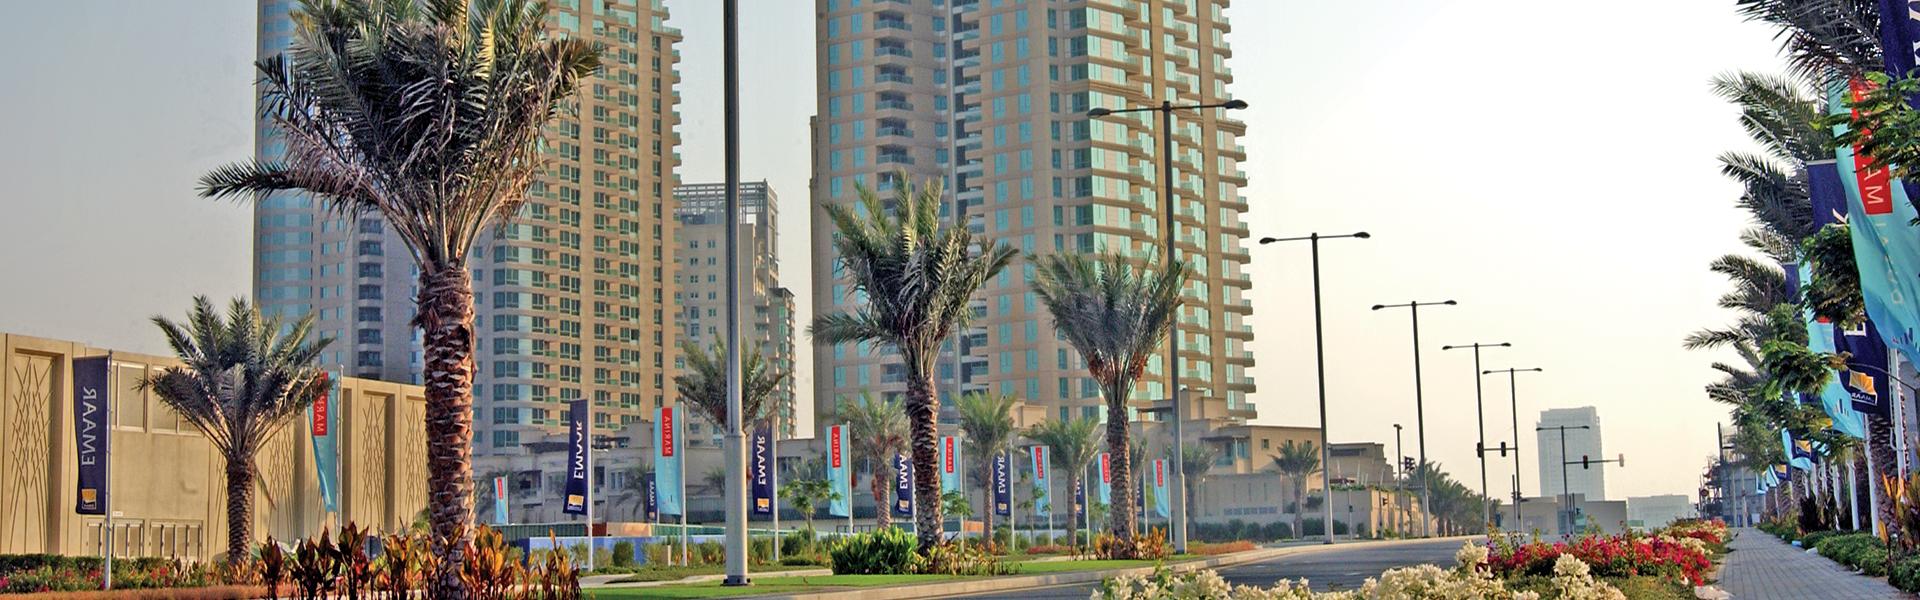 Streetscape International Llc World Leader In Urban